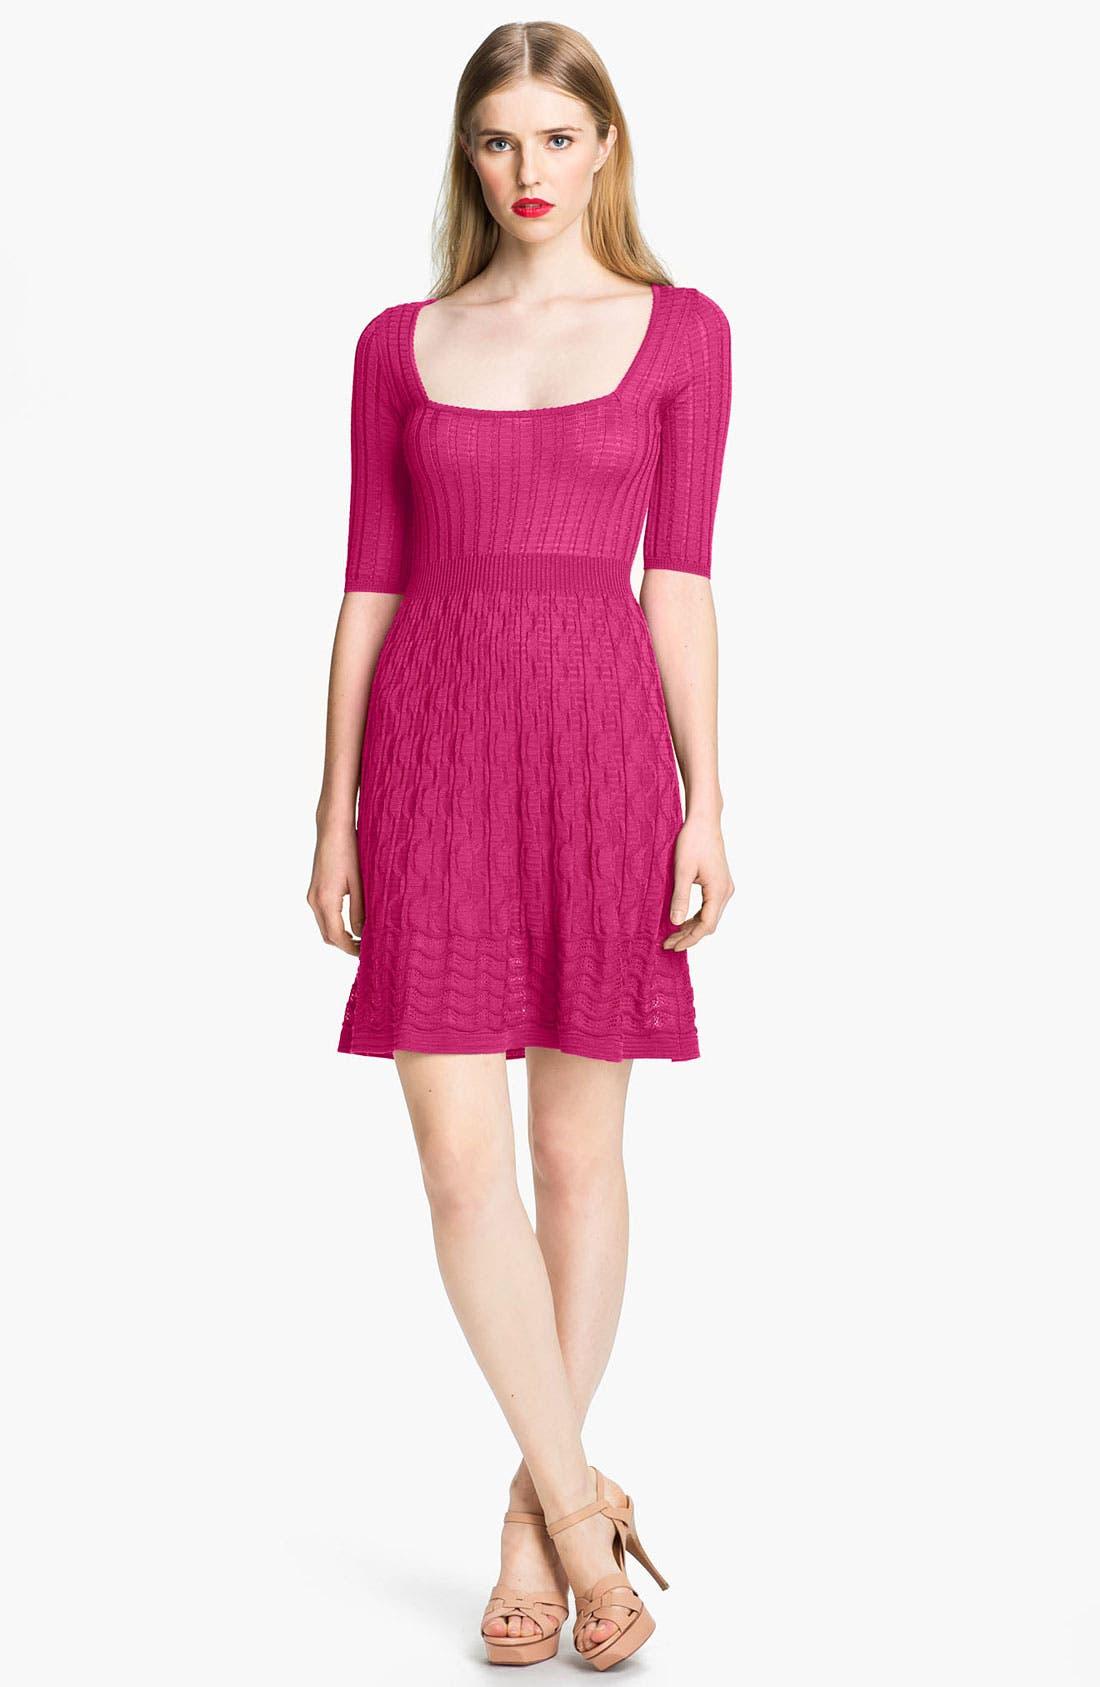 Main Image - M Missoni Knit Dress